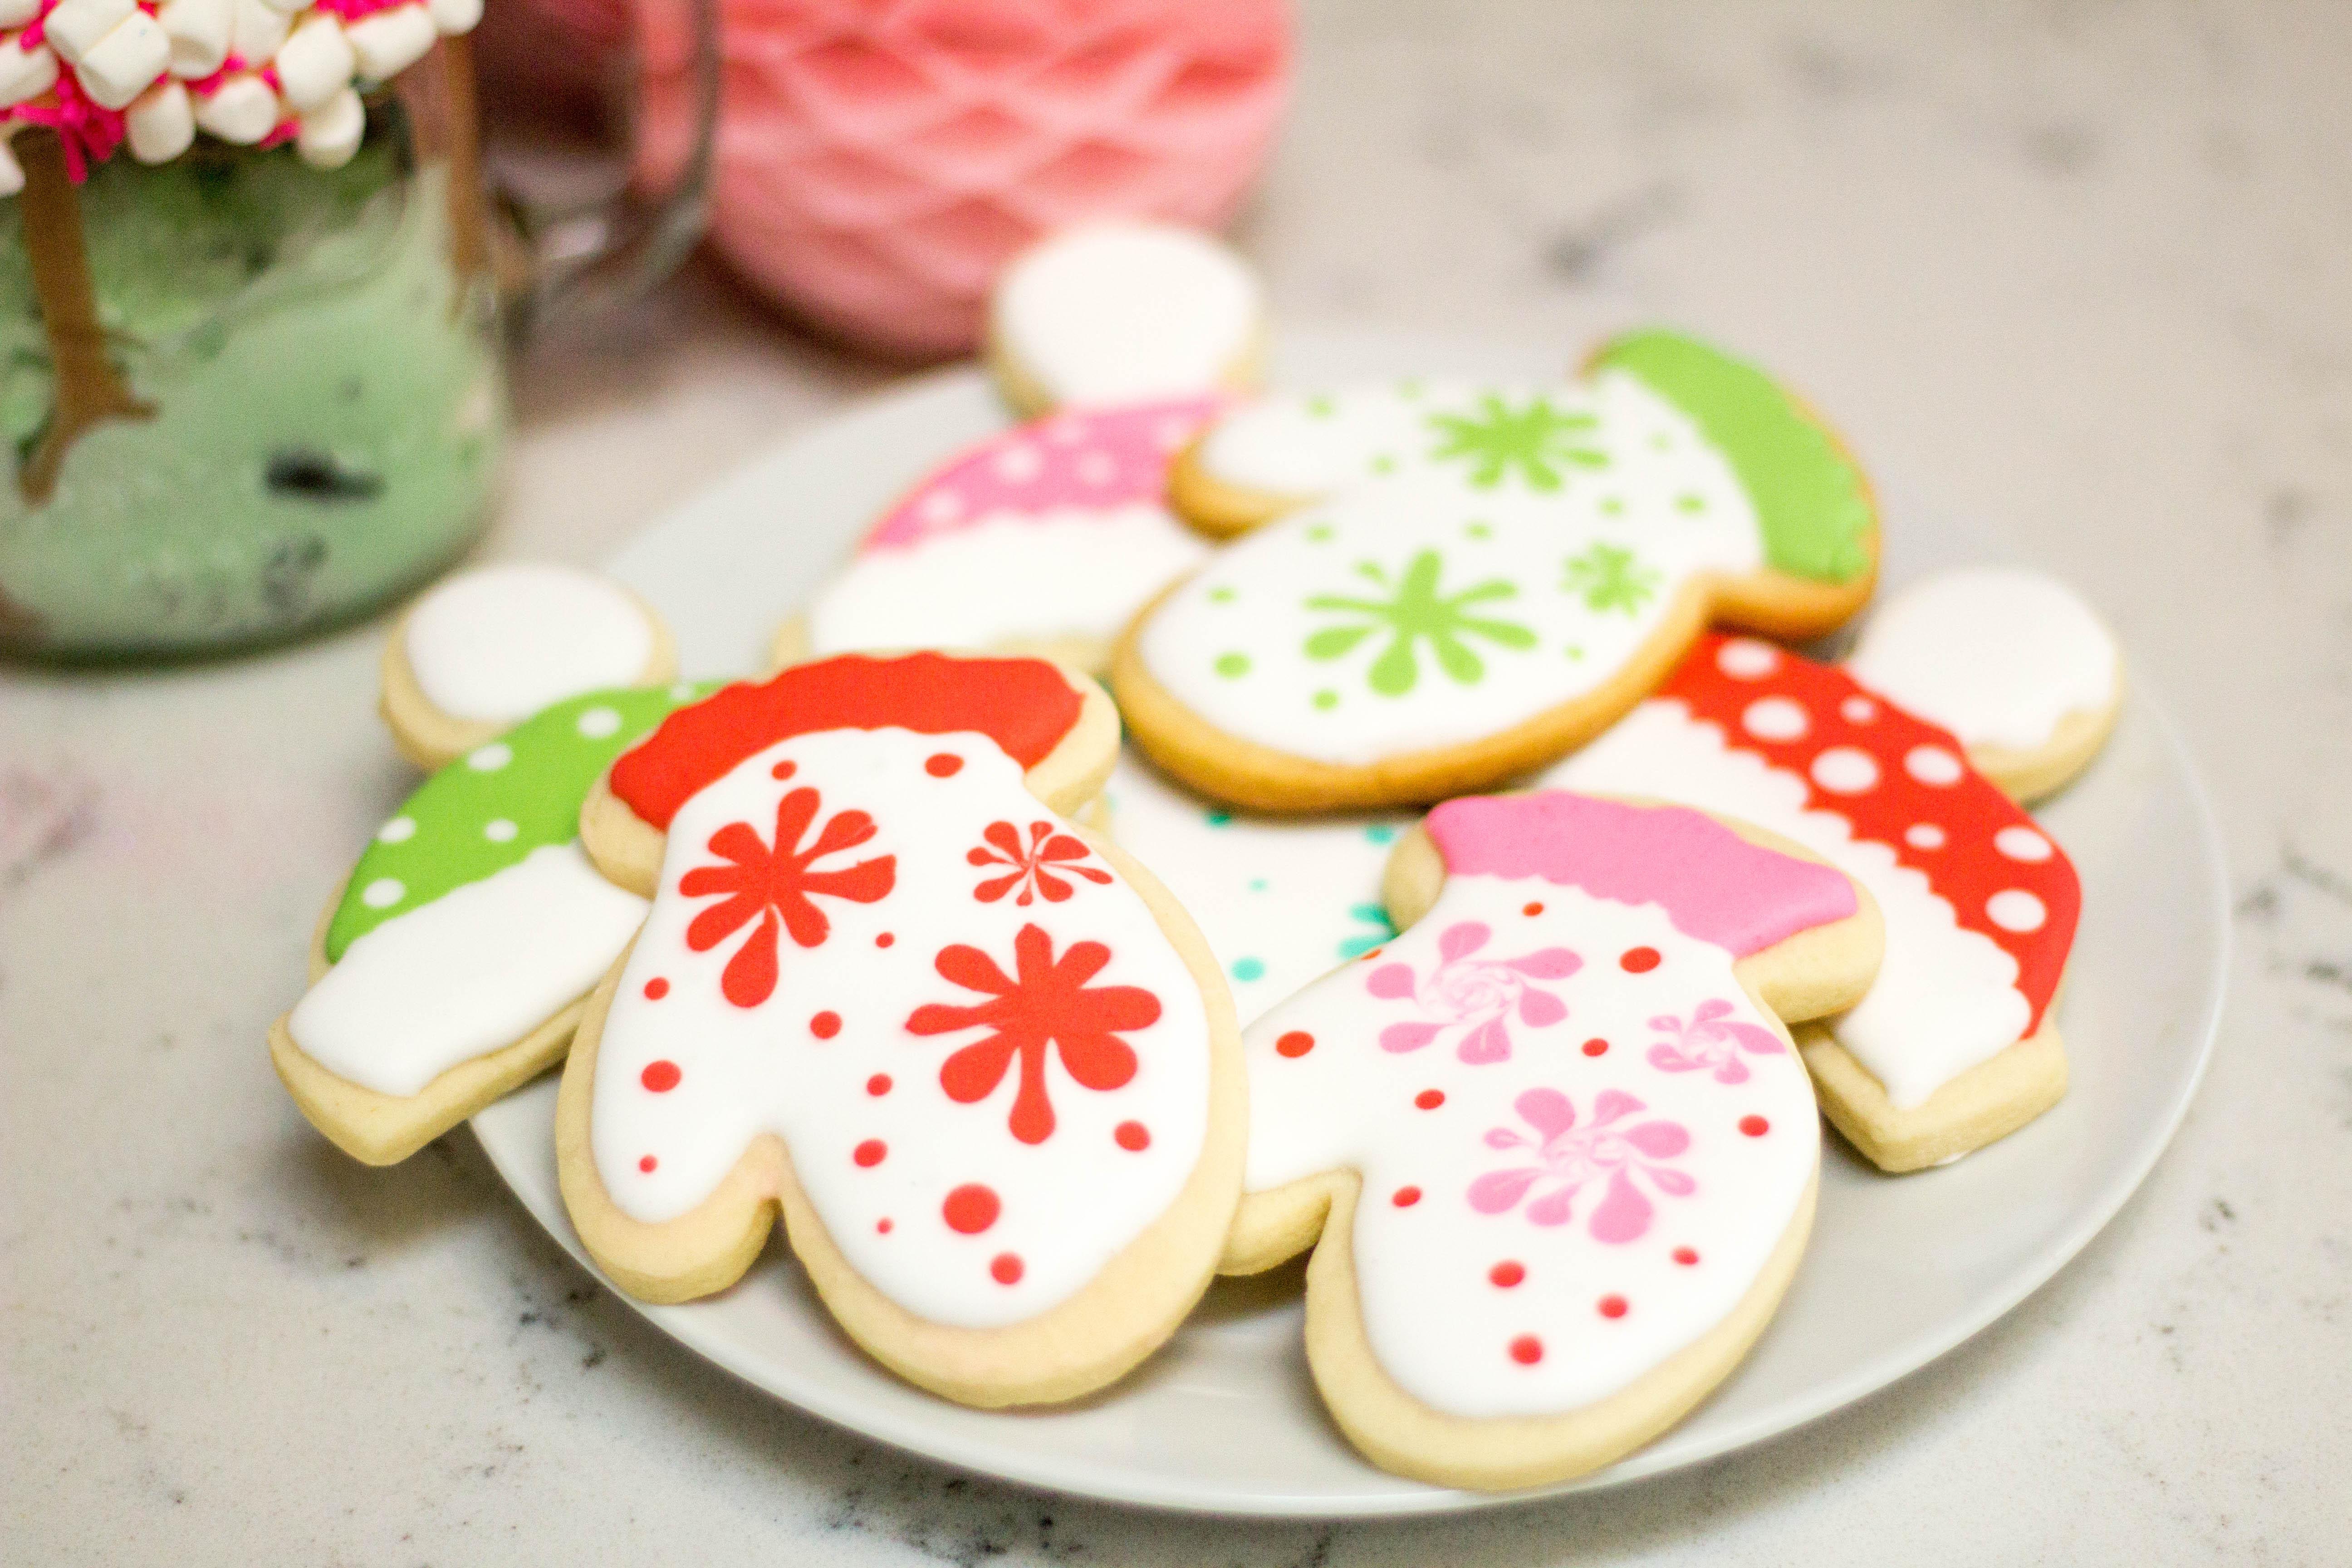 winter-baking-ice-cream-freak-shake-creative-desserts-overload-25